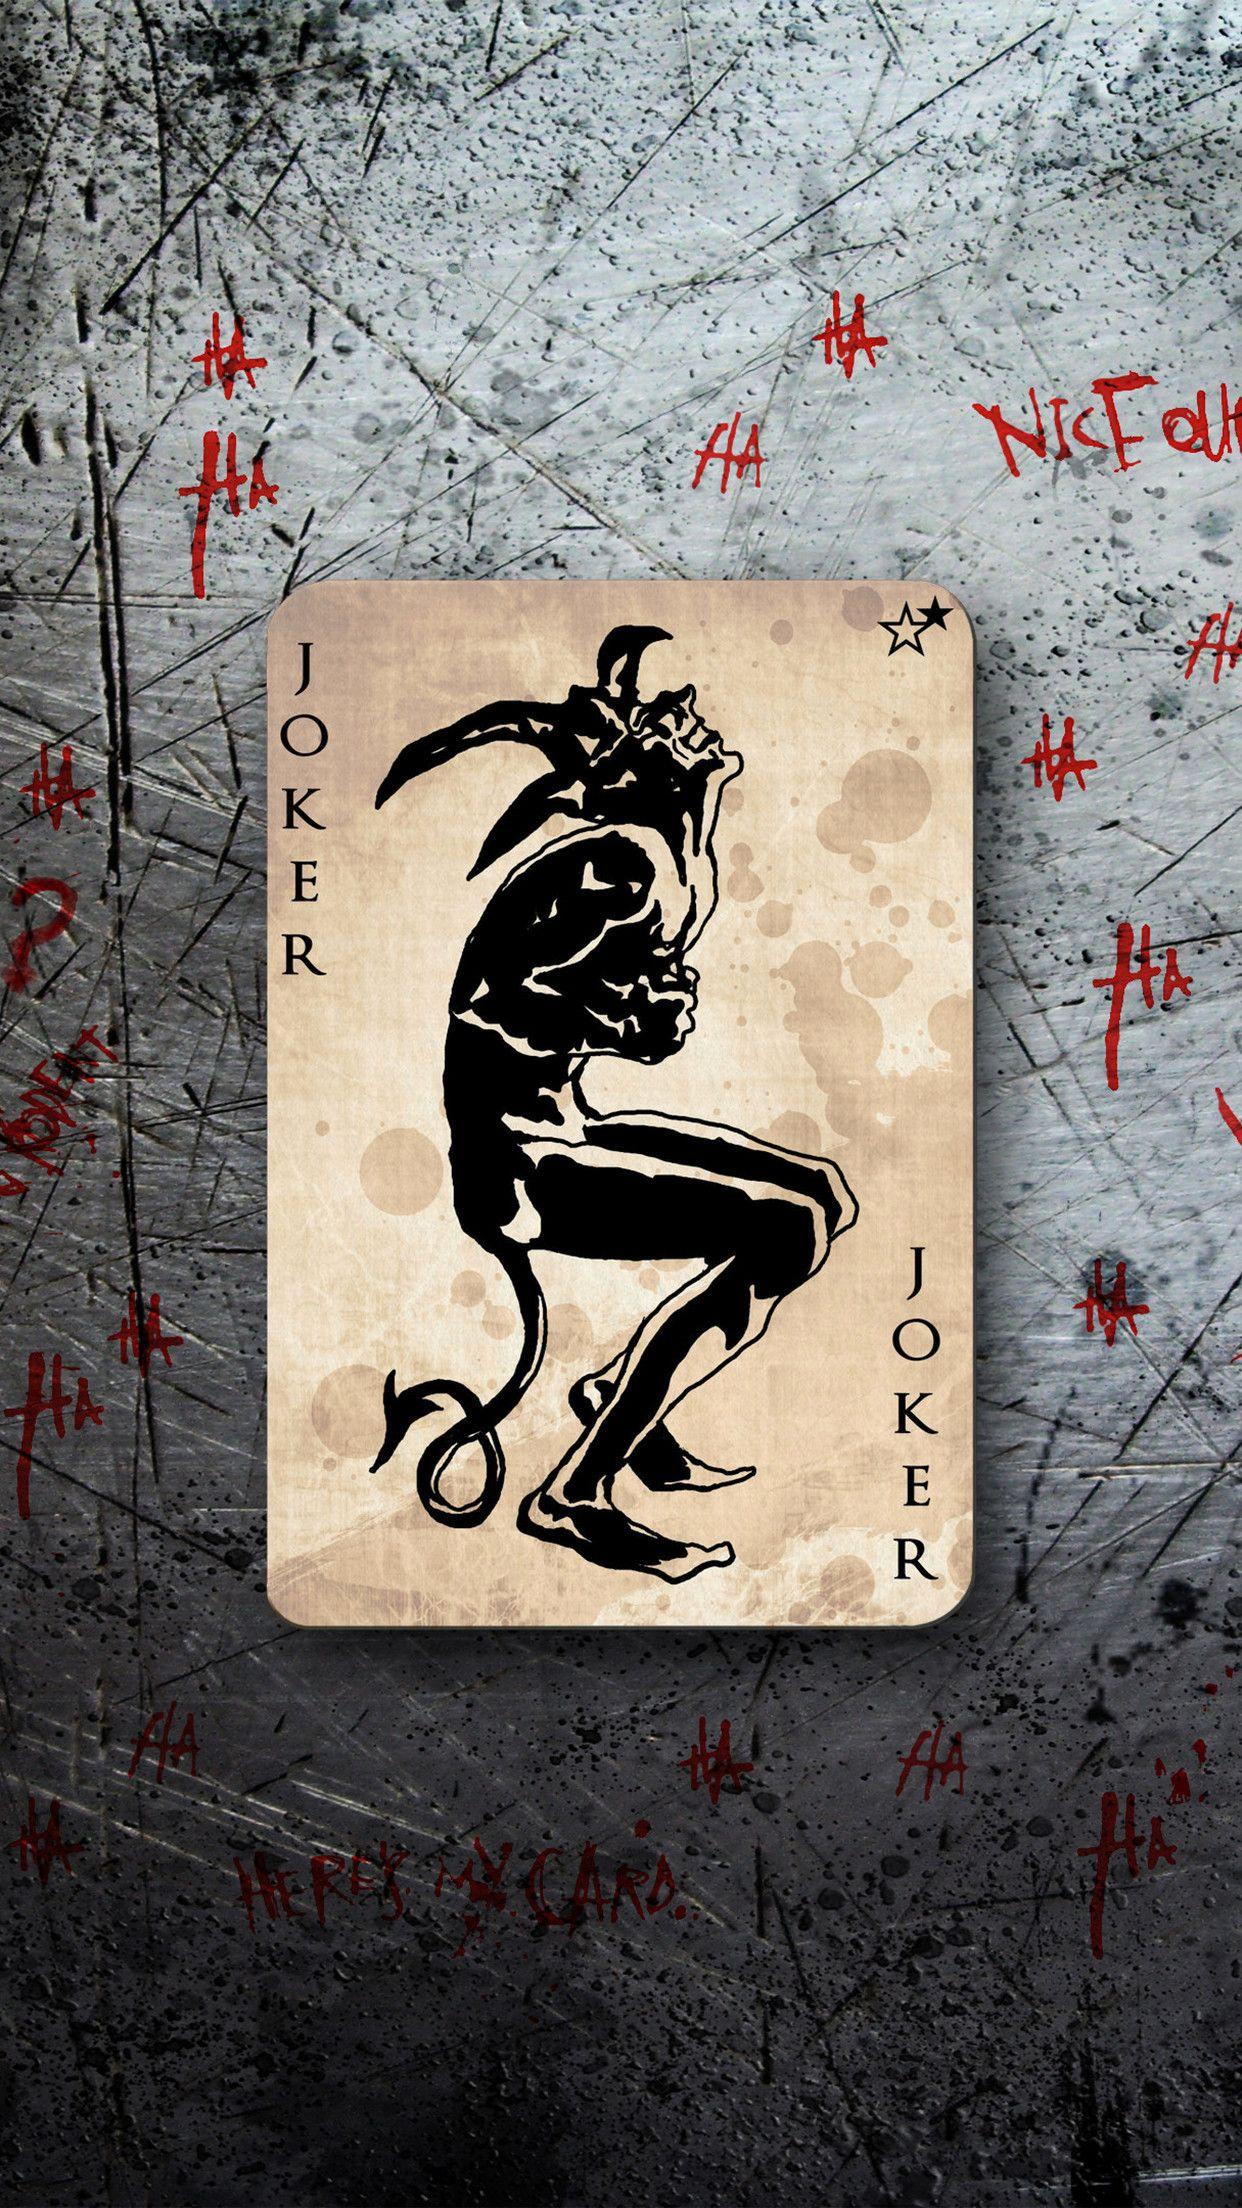 Iphone 6 Joker Wallpaper Joker Wallpapers Joker Card Joker Background